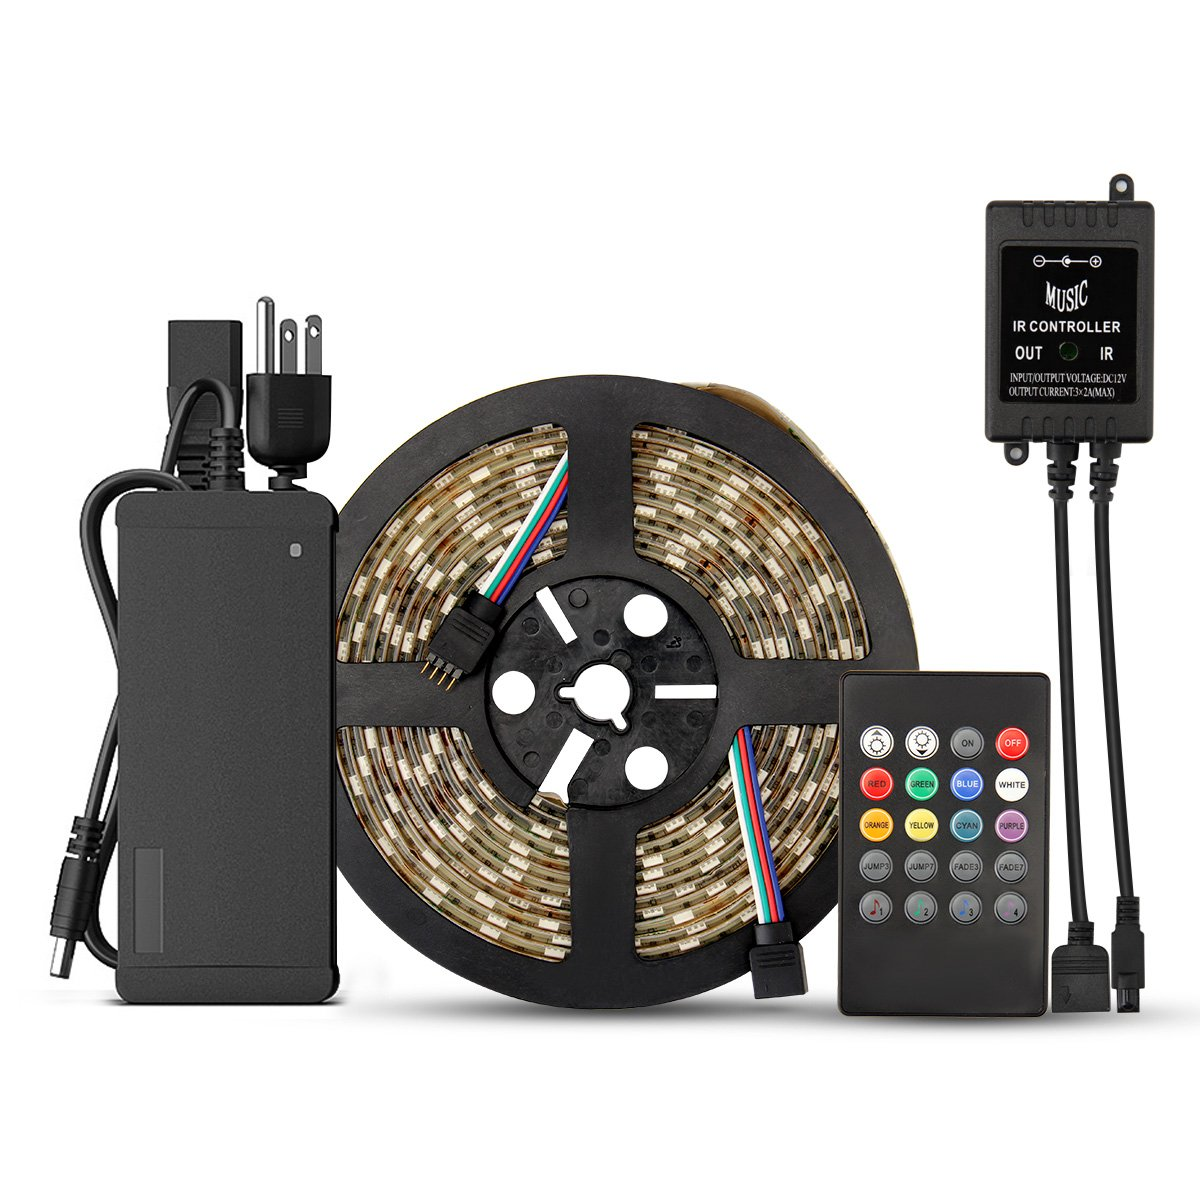 SUPERNIGHT 5M 300LEDs RGB Waterproof Flexible 5050 LED Strip Light with 20Key IR Music Remote Controller (RGB+20Keys Remote +Power Supply)